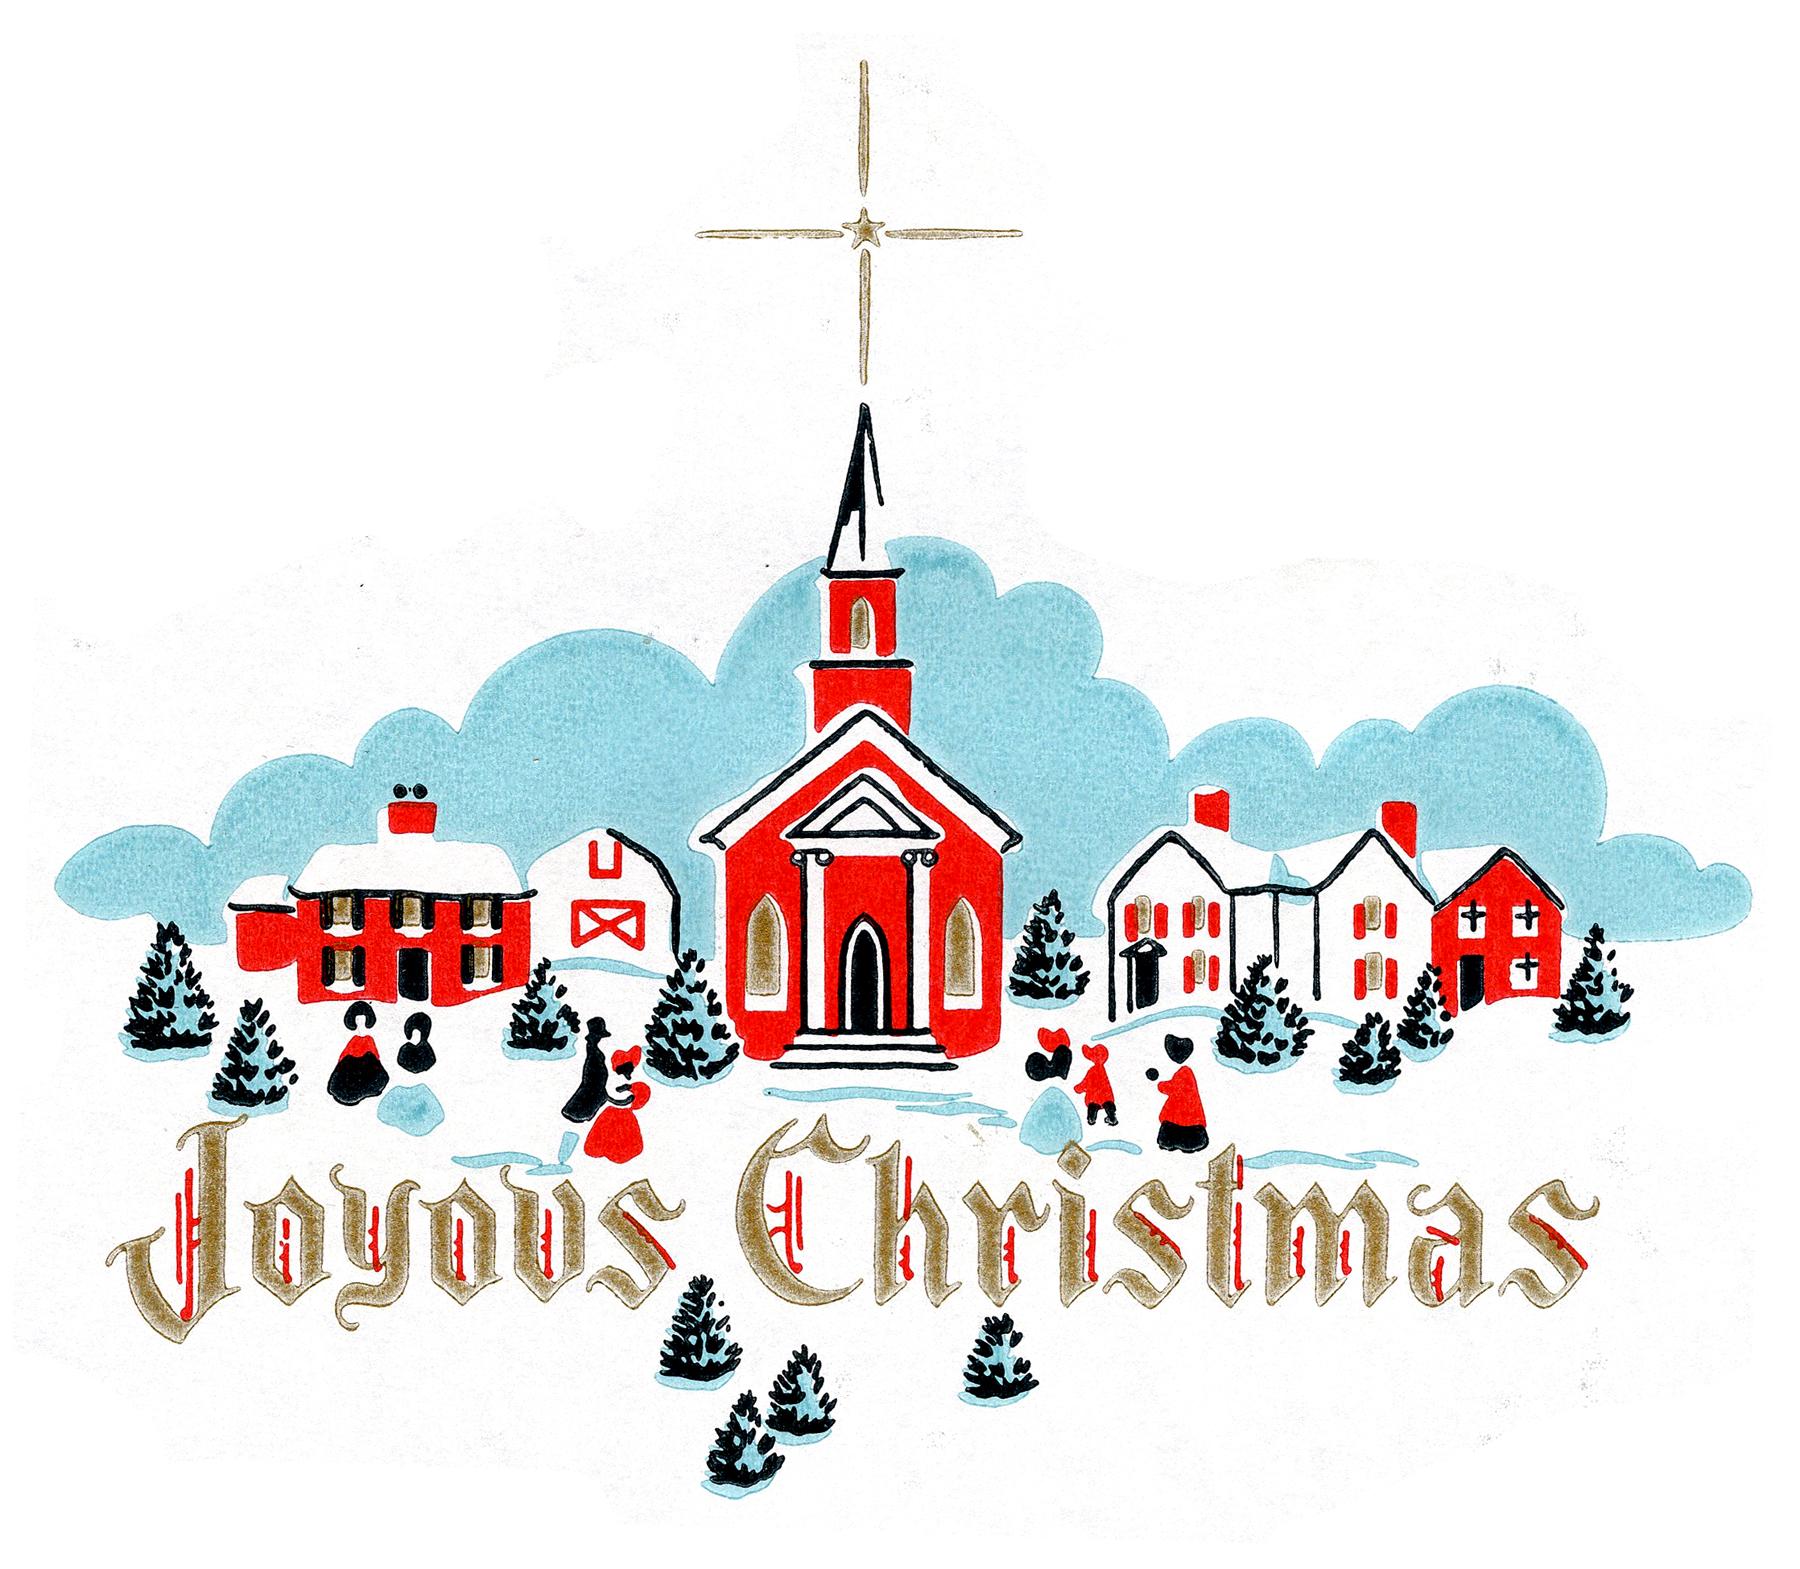 Adorable Retro Christmas Church Scene! - The Graphics Fairy